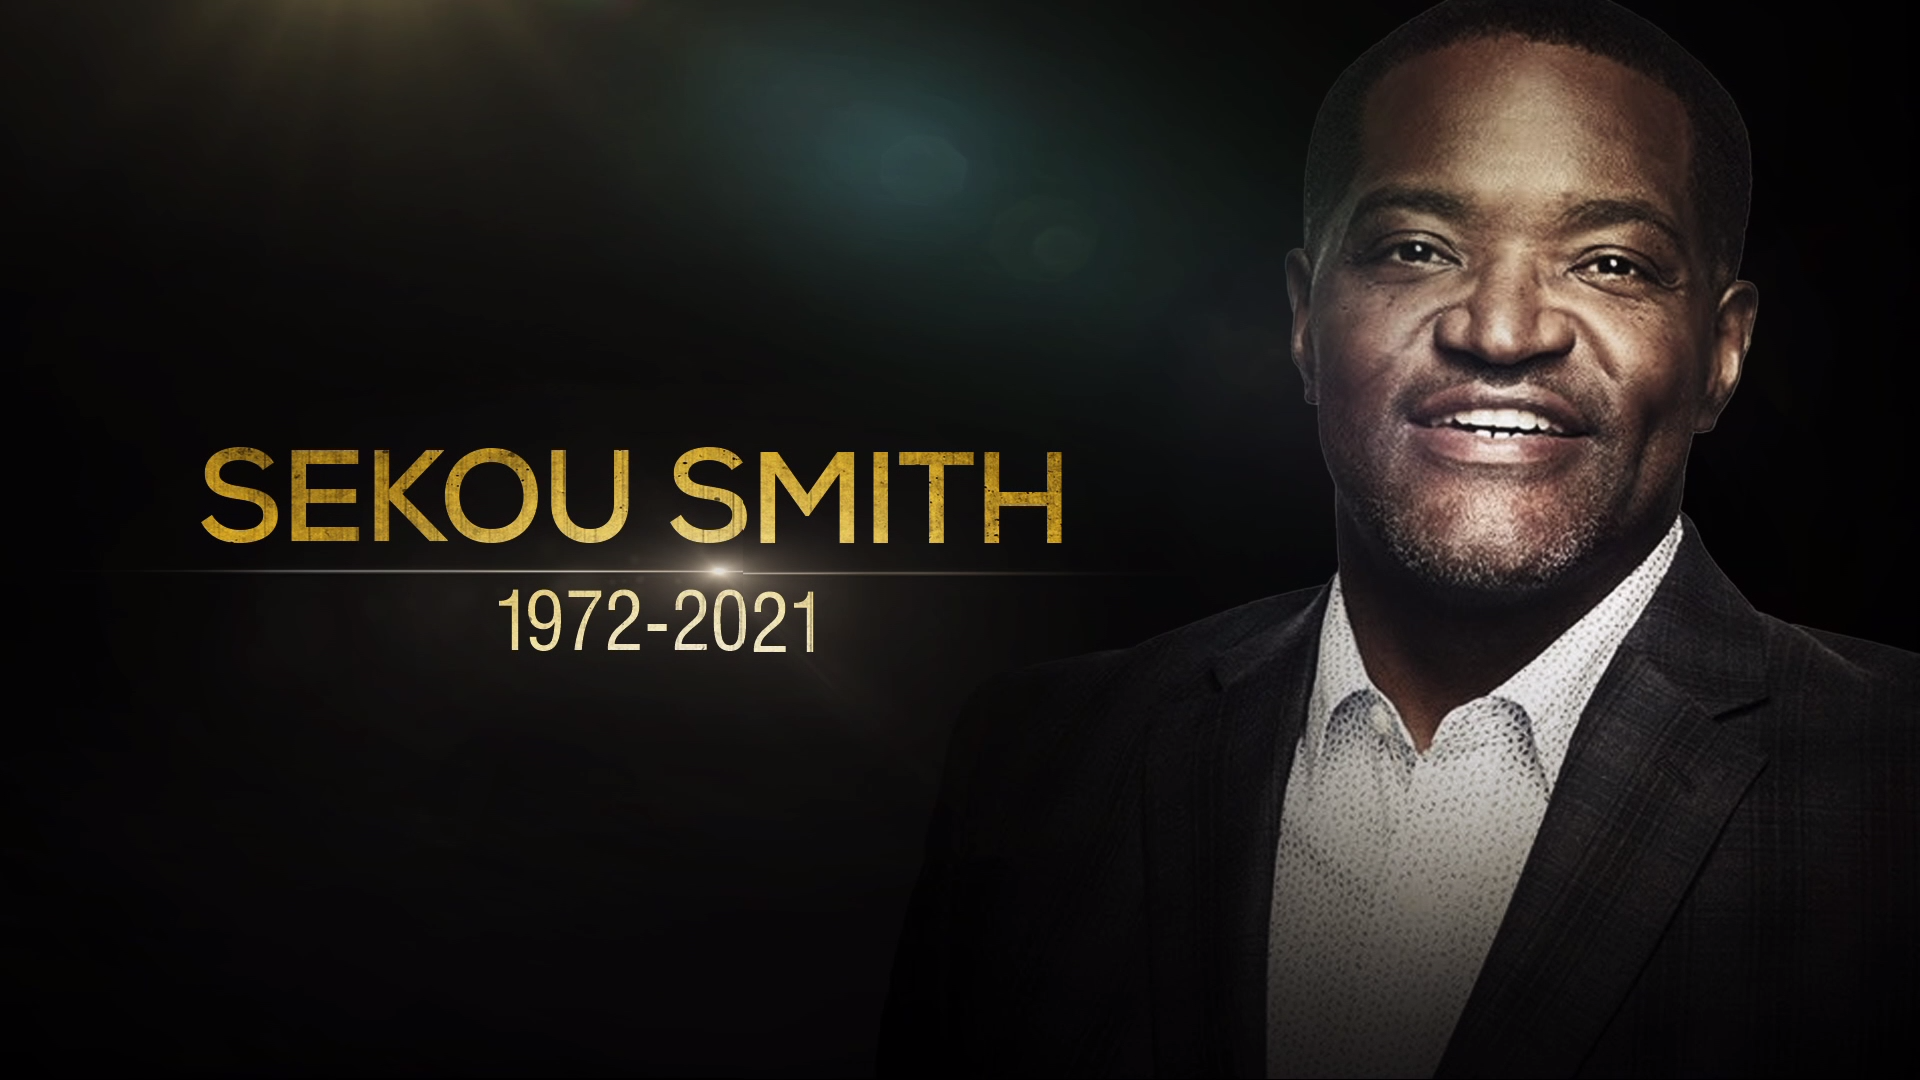 Honoring Sekou Smith, our own MVP